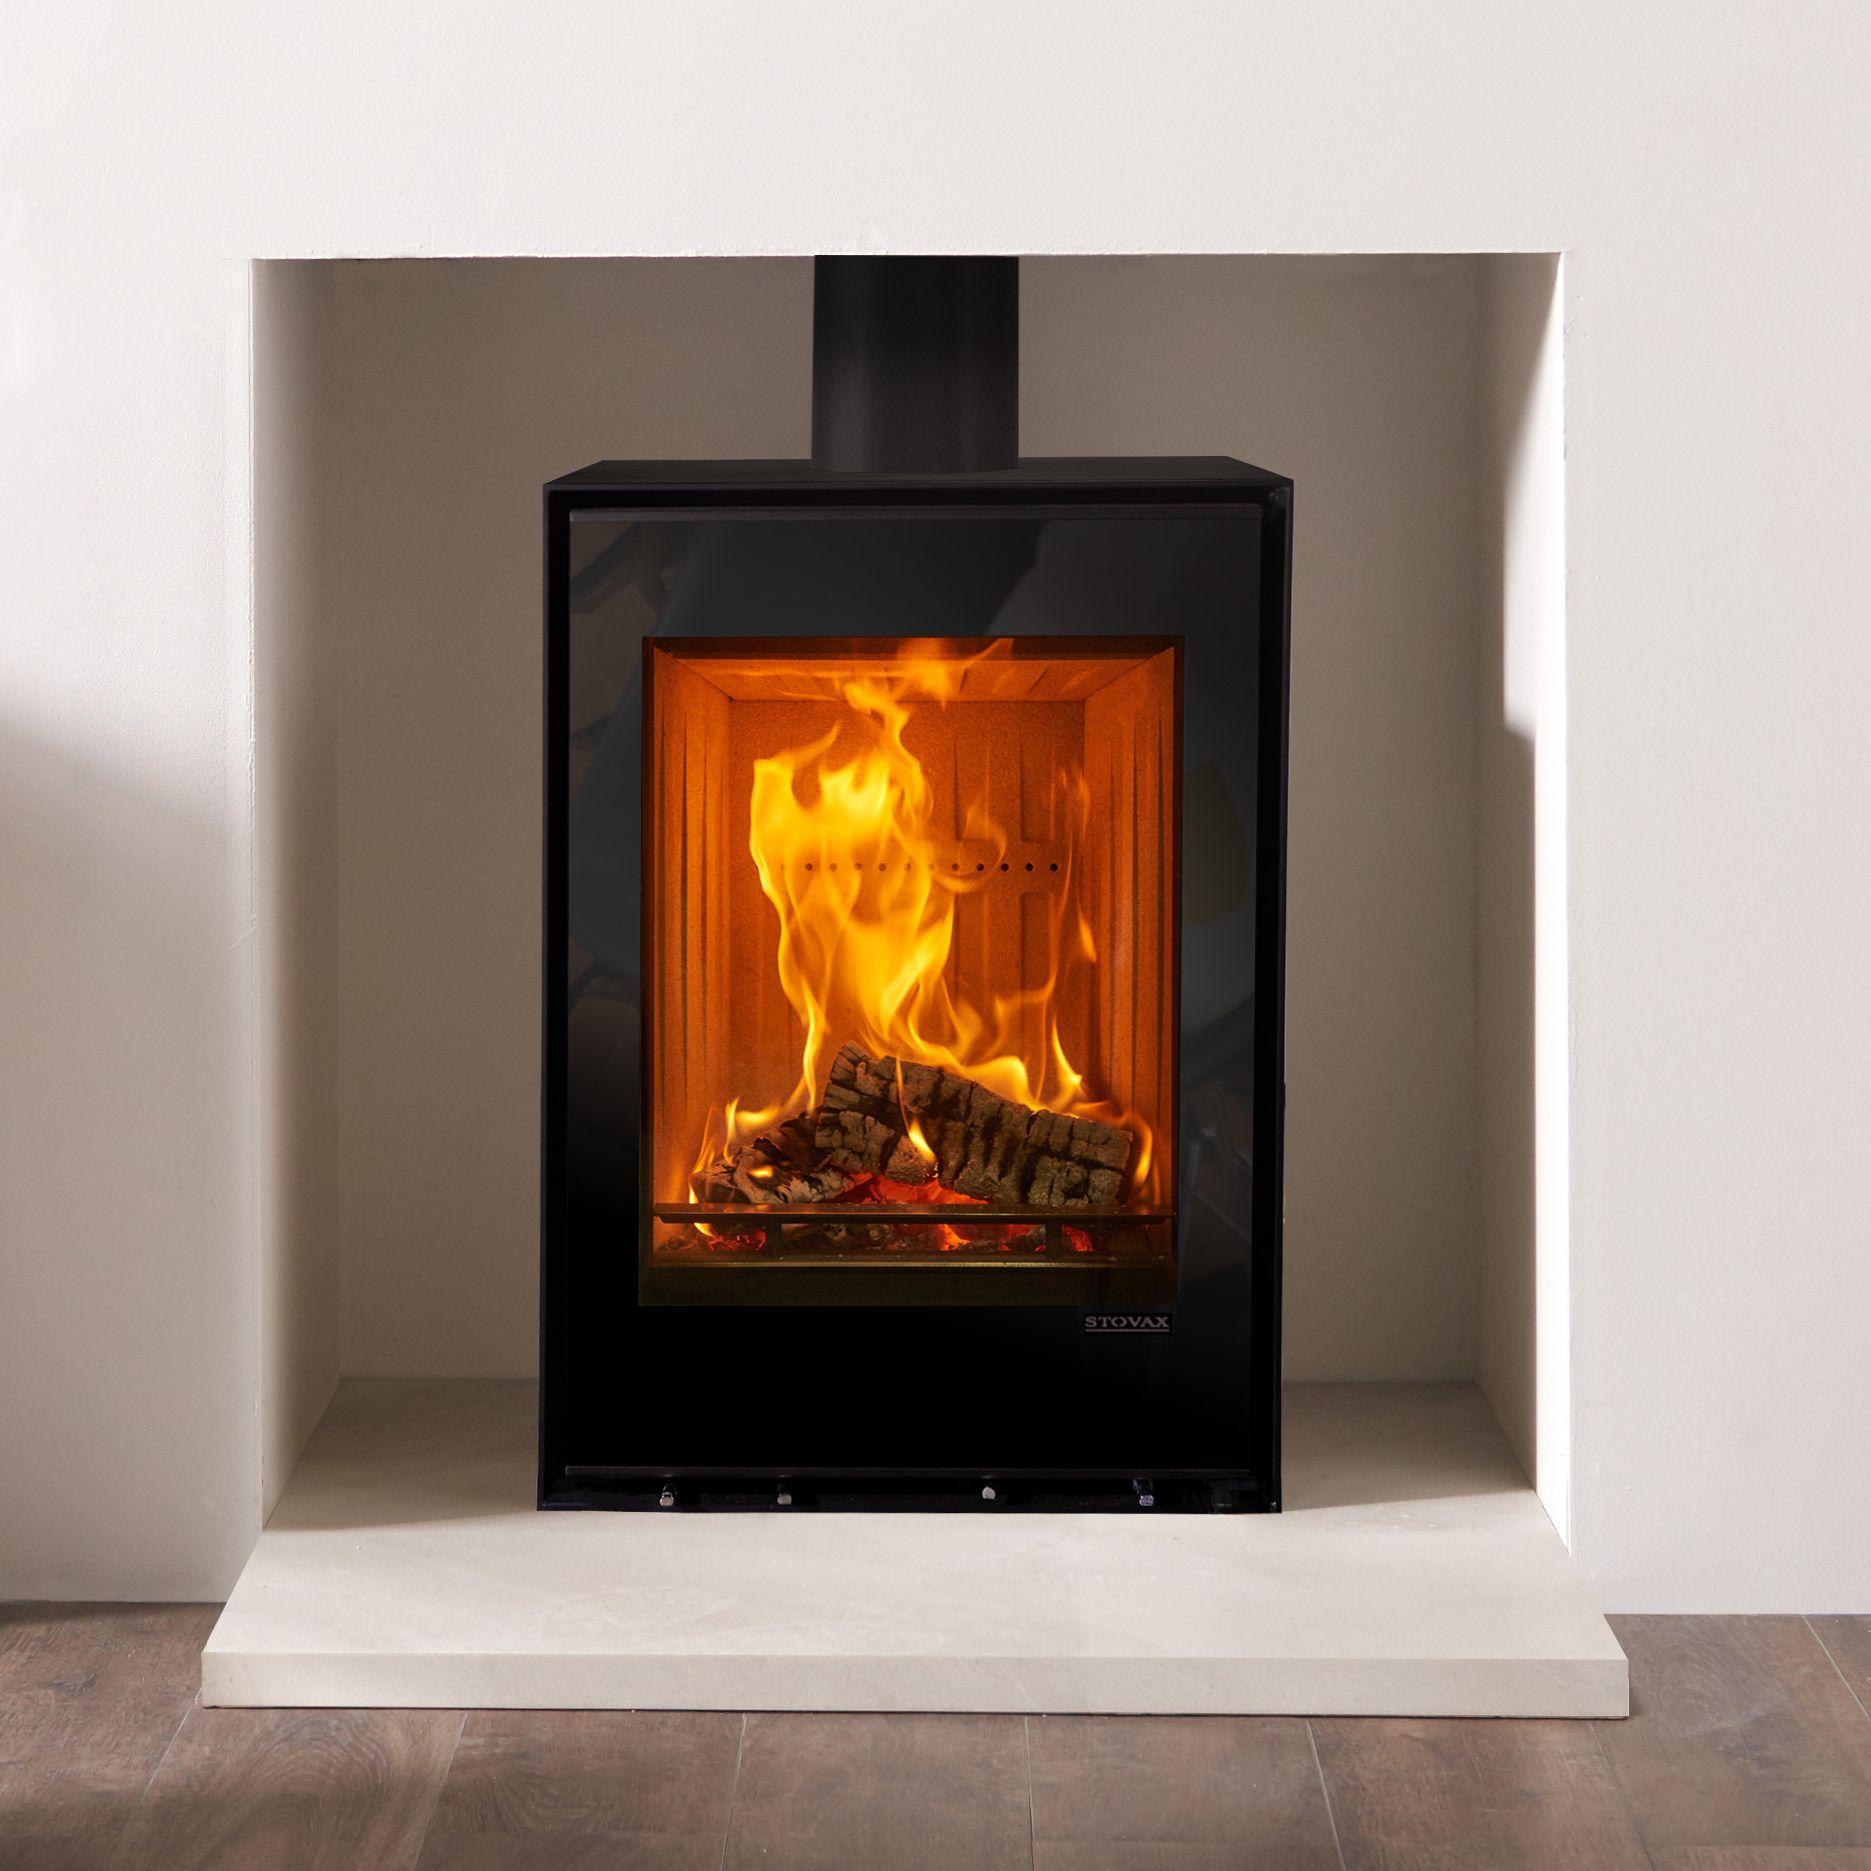 Freestanding Elise 540T Wood Burning and Multifuel Stoves